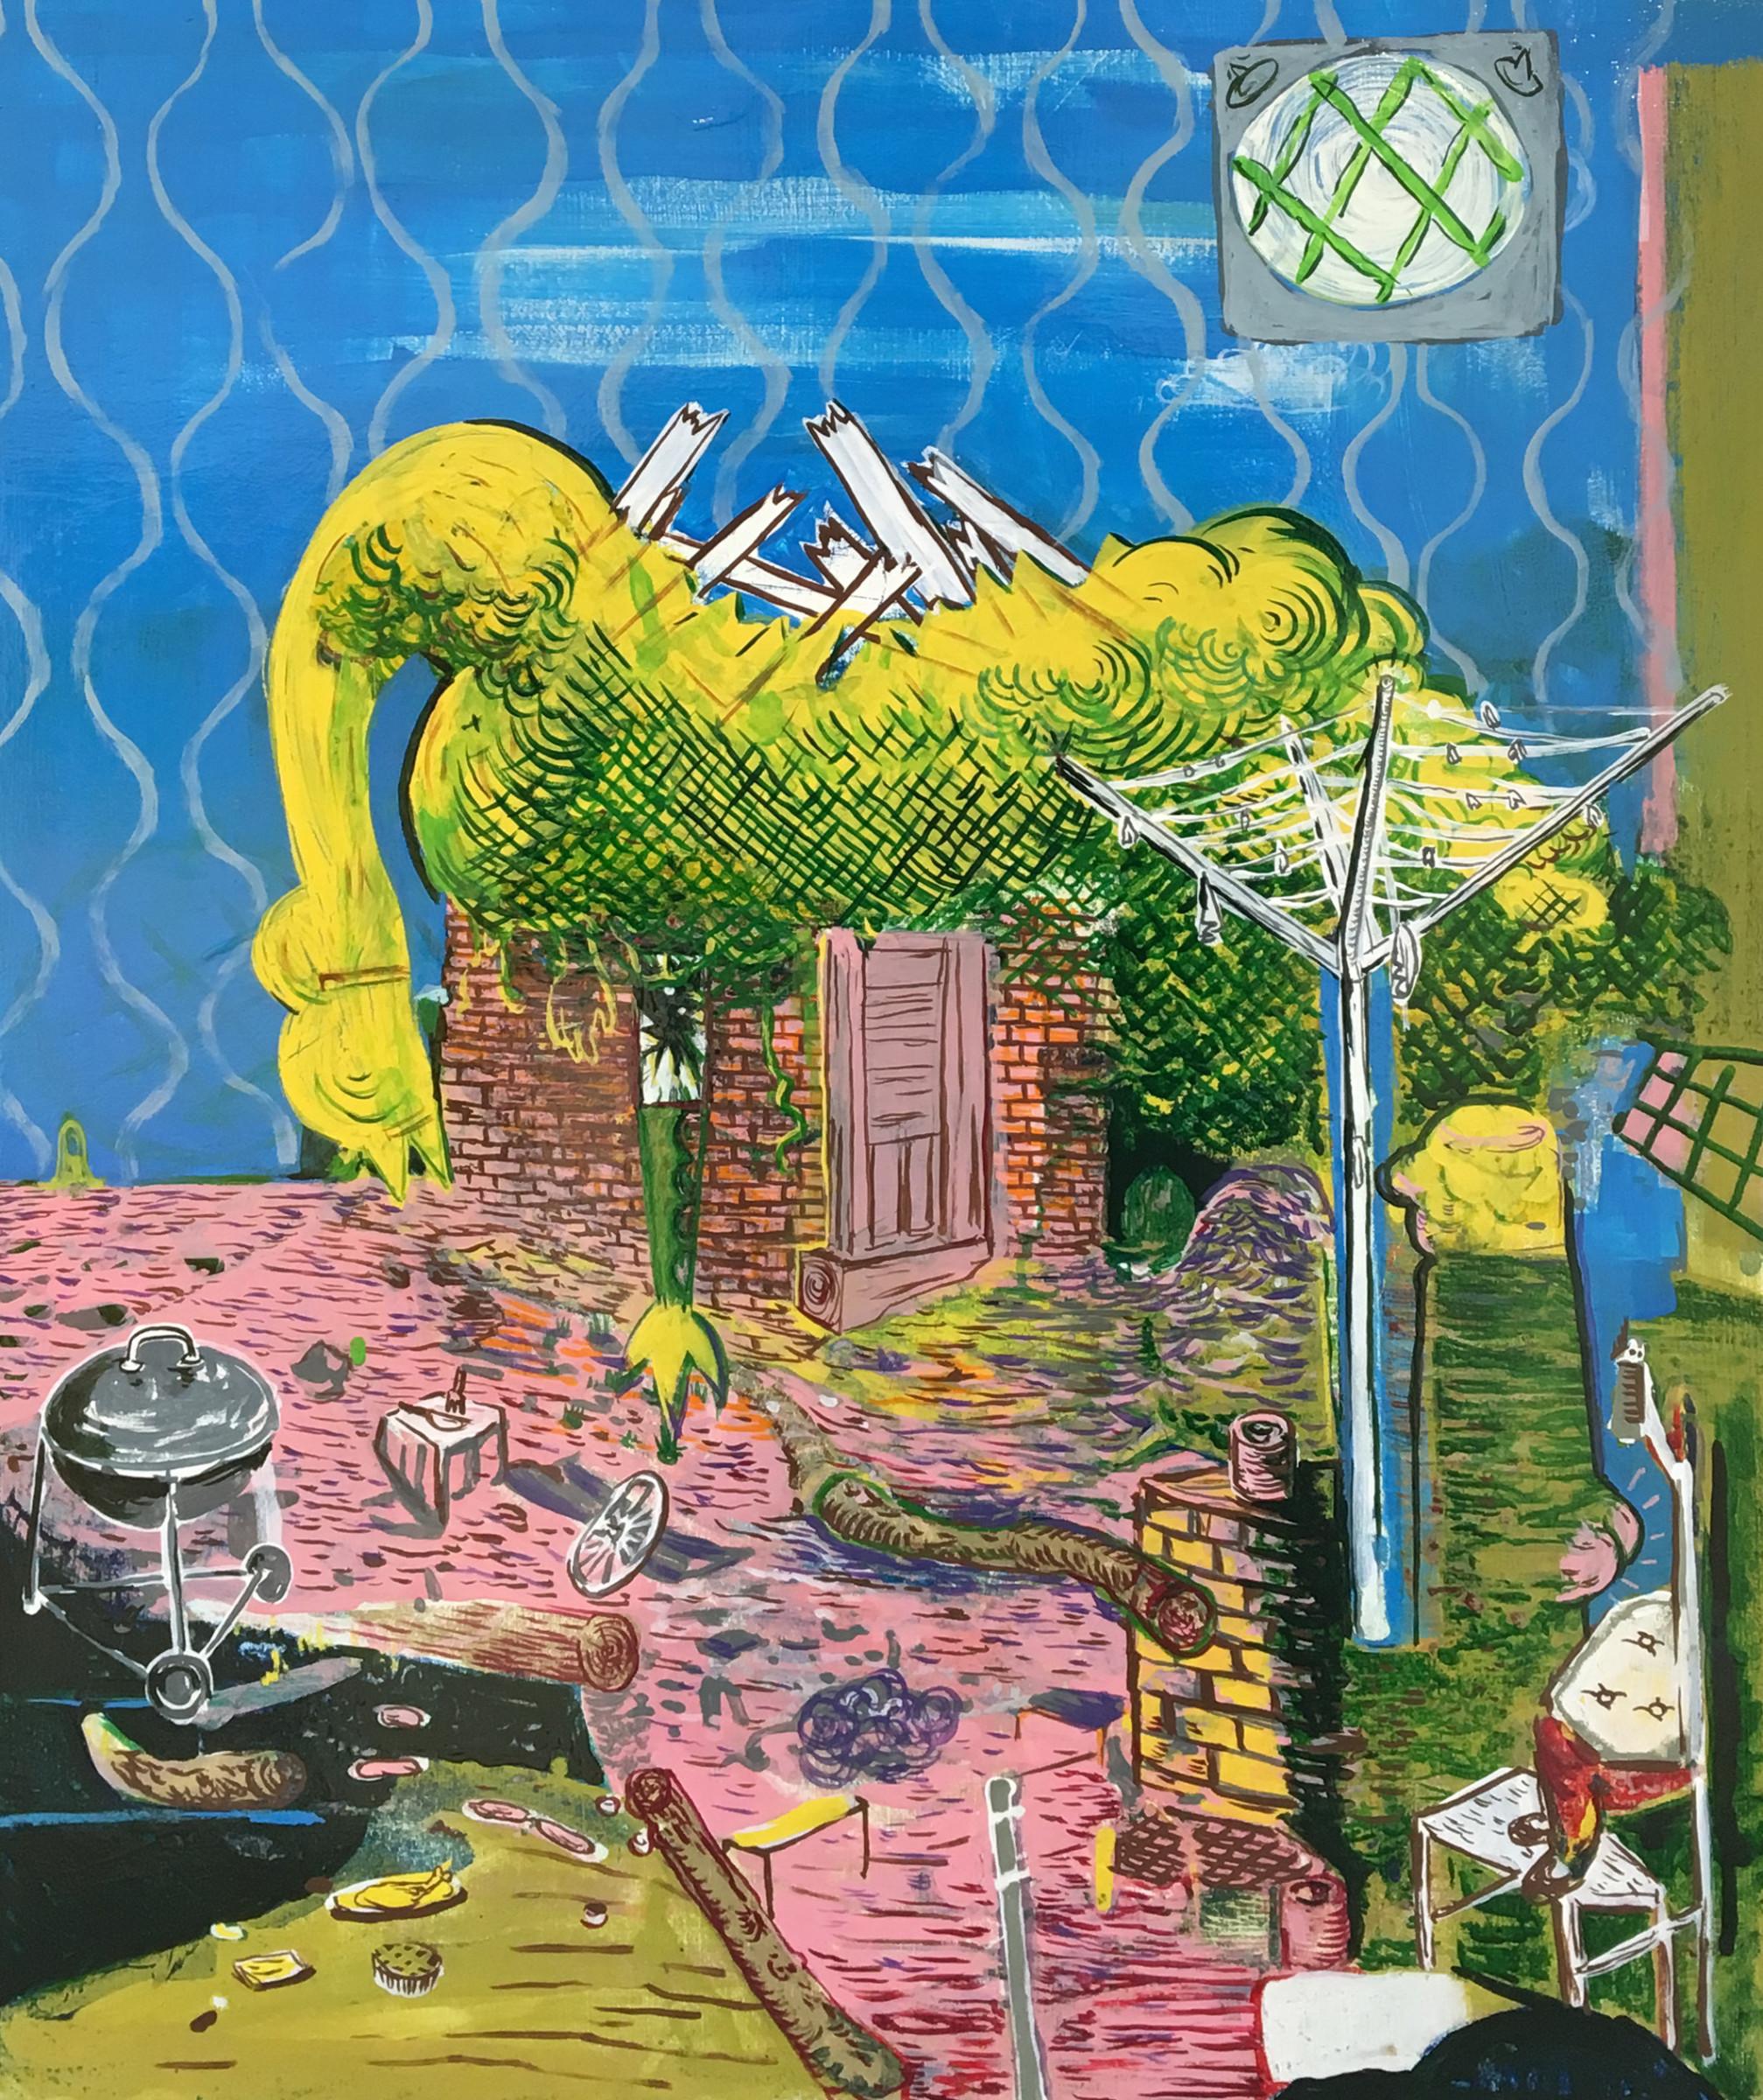 "<span class=""link fancybox-details-link""><a href=""/artists/50-david-price/works/295/"">View Detail Page</a></span><div class=""artist""><strong>David Price</strong></div> b.1972 <div class=""title""><em>The Rubber Chicken's Dream</em>, 2017</div> <div class=""medium"">oil on panel</div> <div class=""dimensions"">19 3/4 x 15 3/4 in<br /> 50 x 40 cm</div><div class=""copyright_line"">Copyright The Artist</div>"